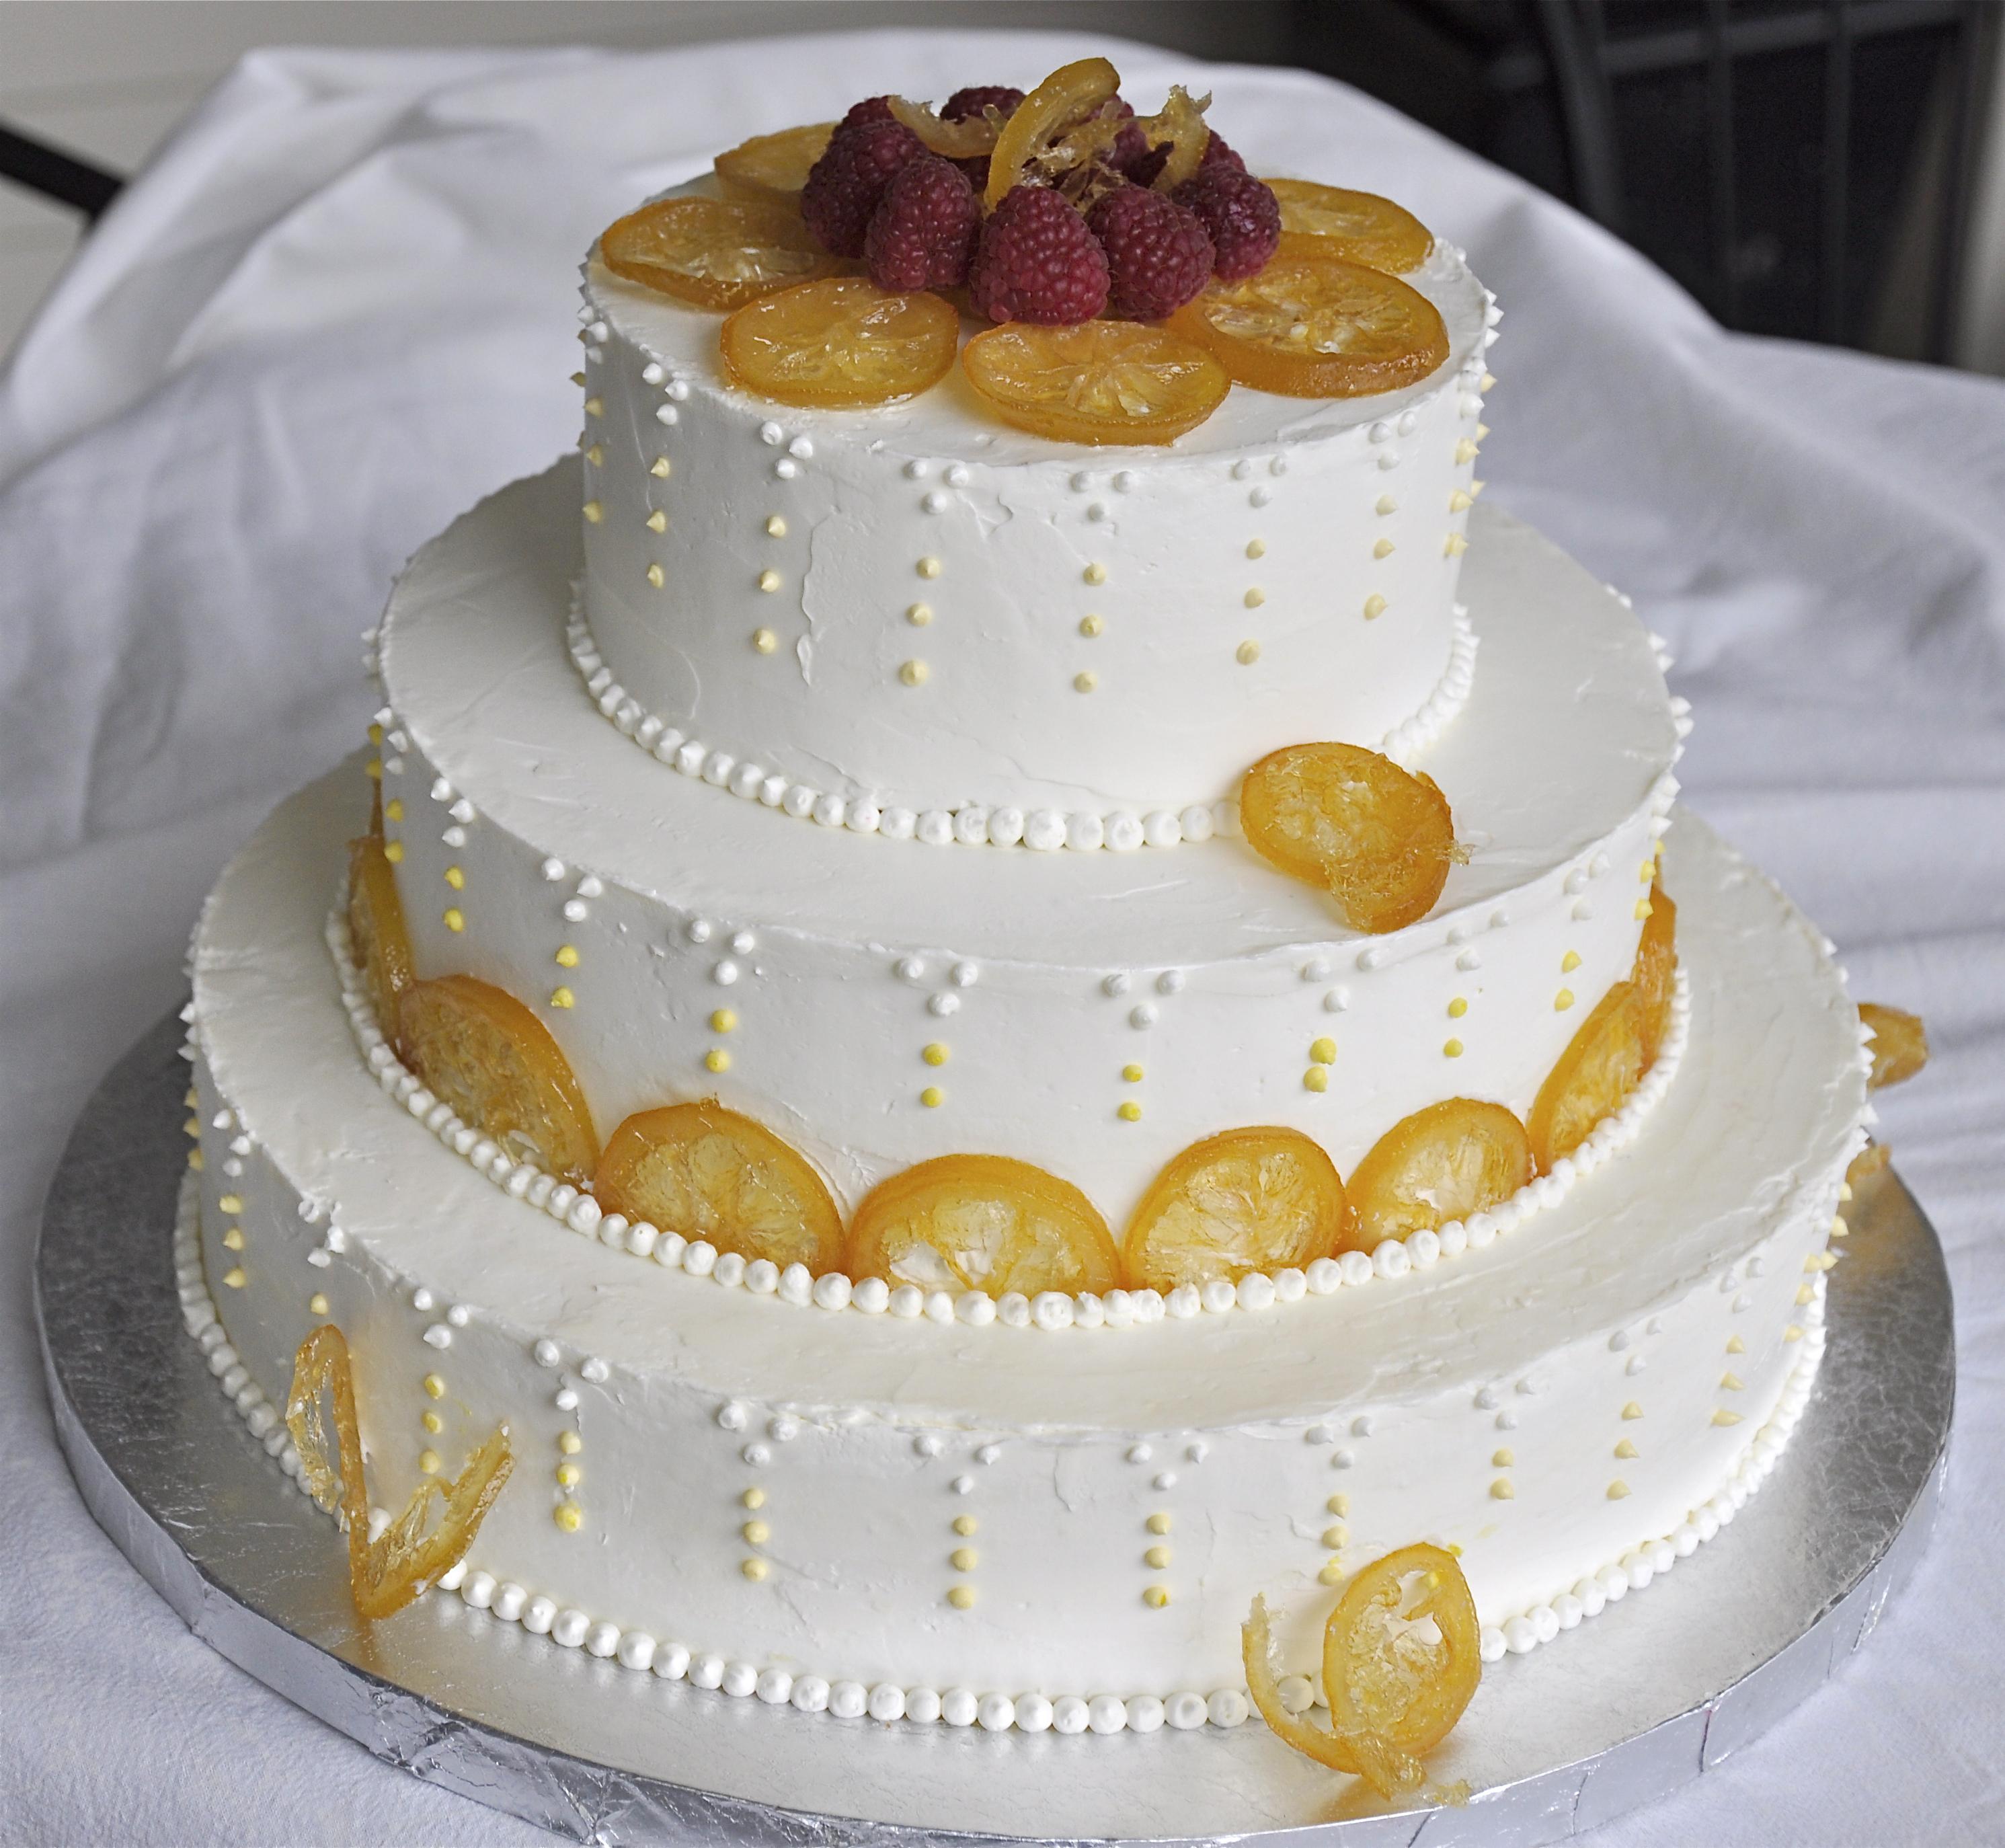 A Wedding Cake - Lemon Tart